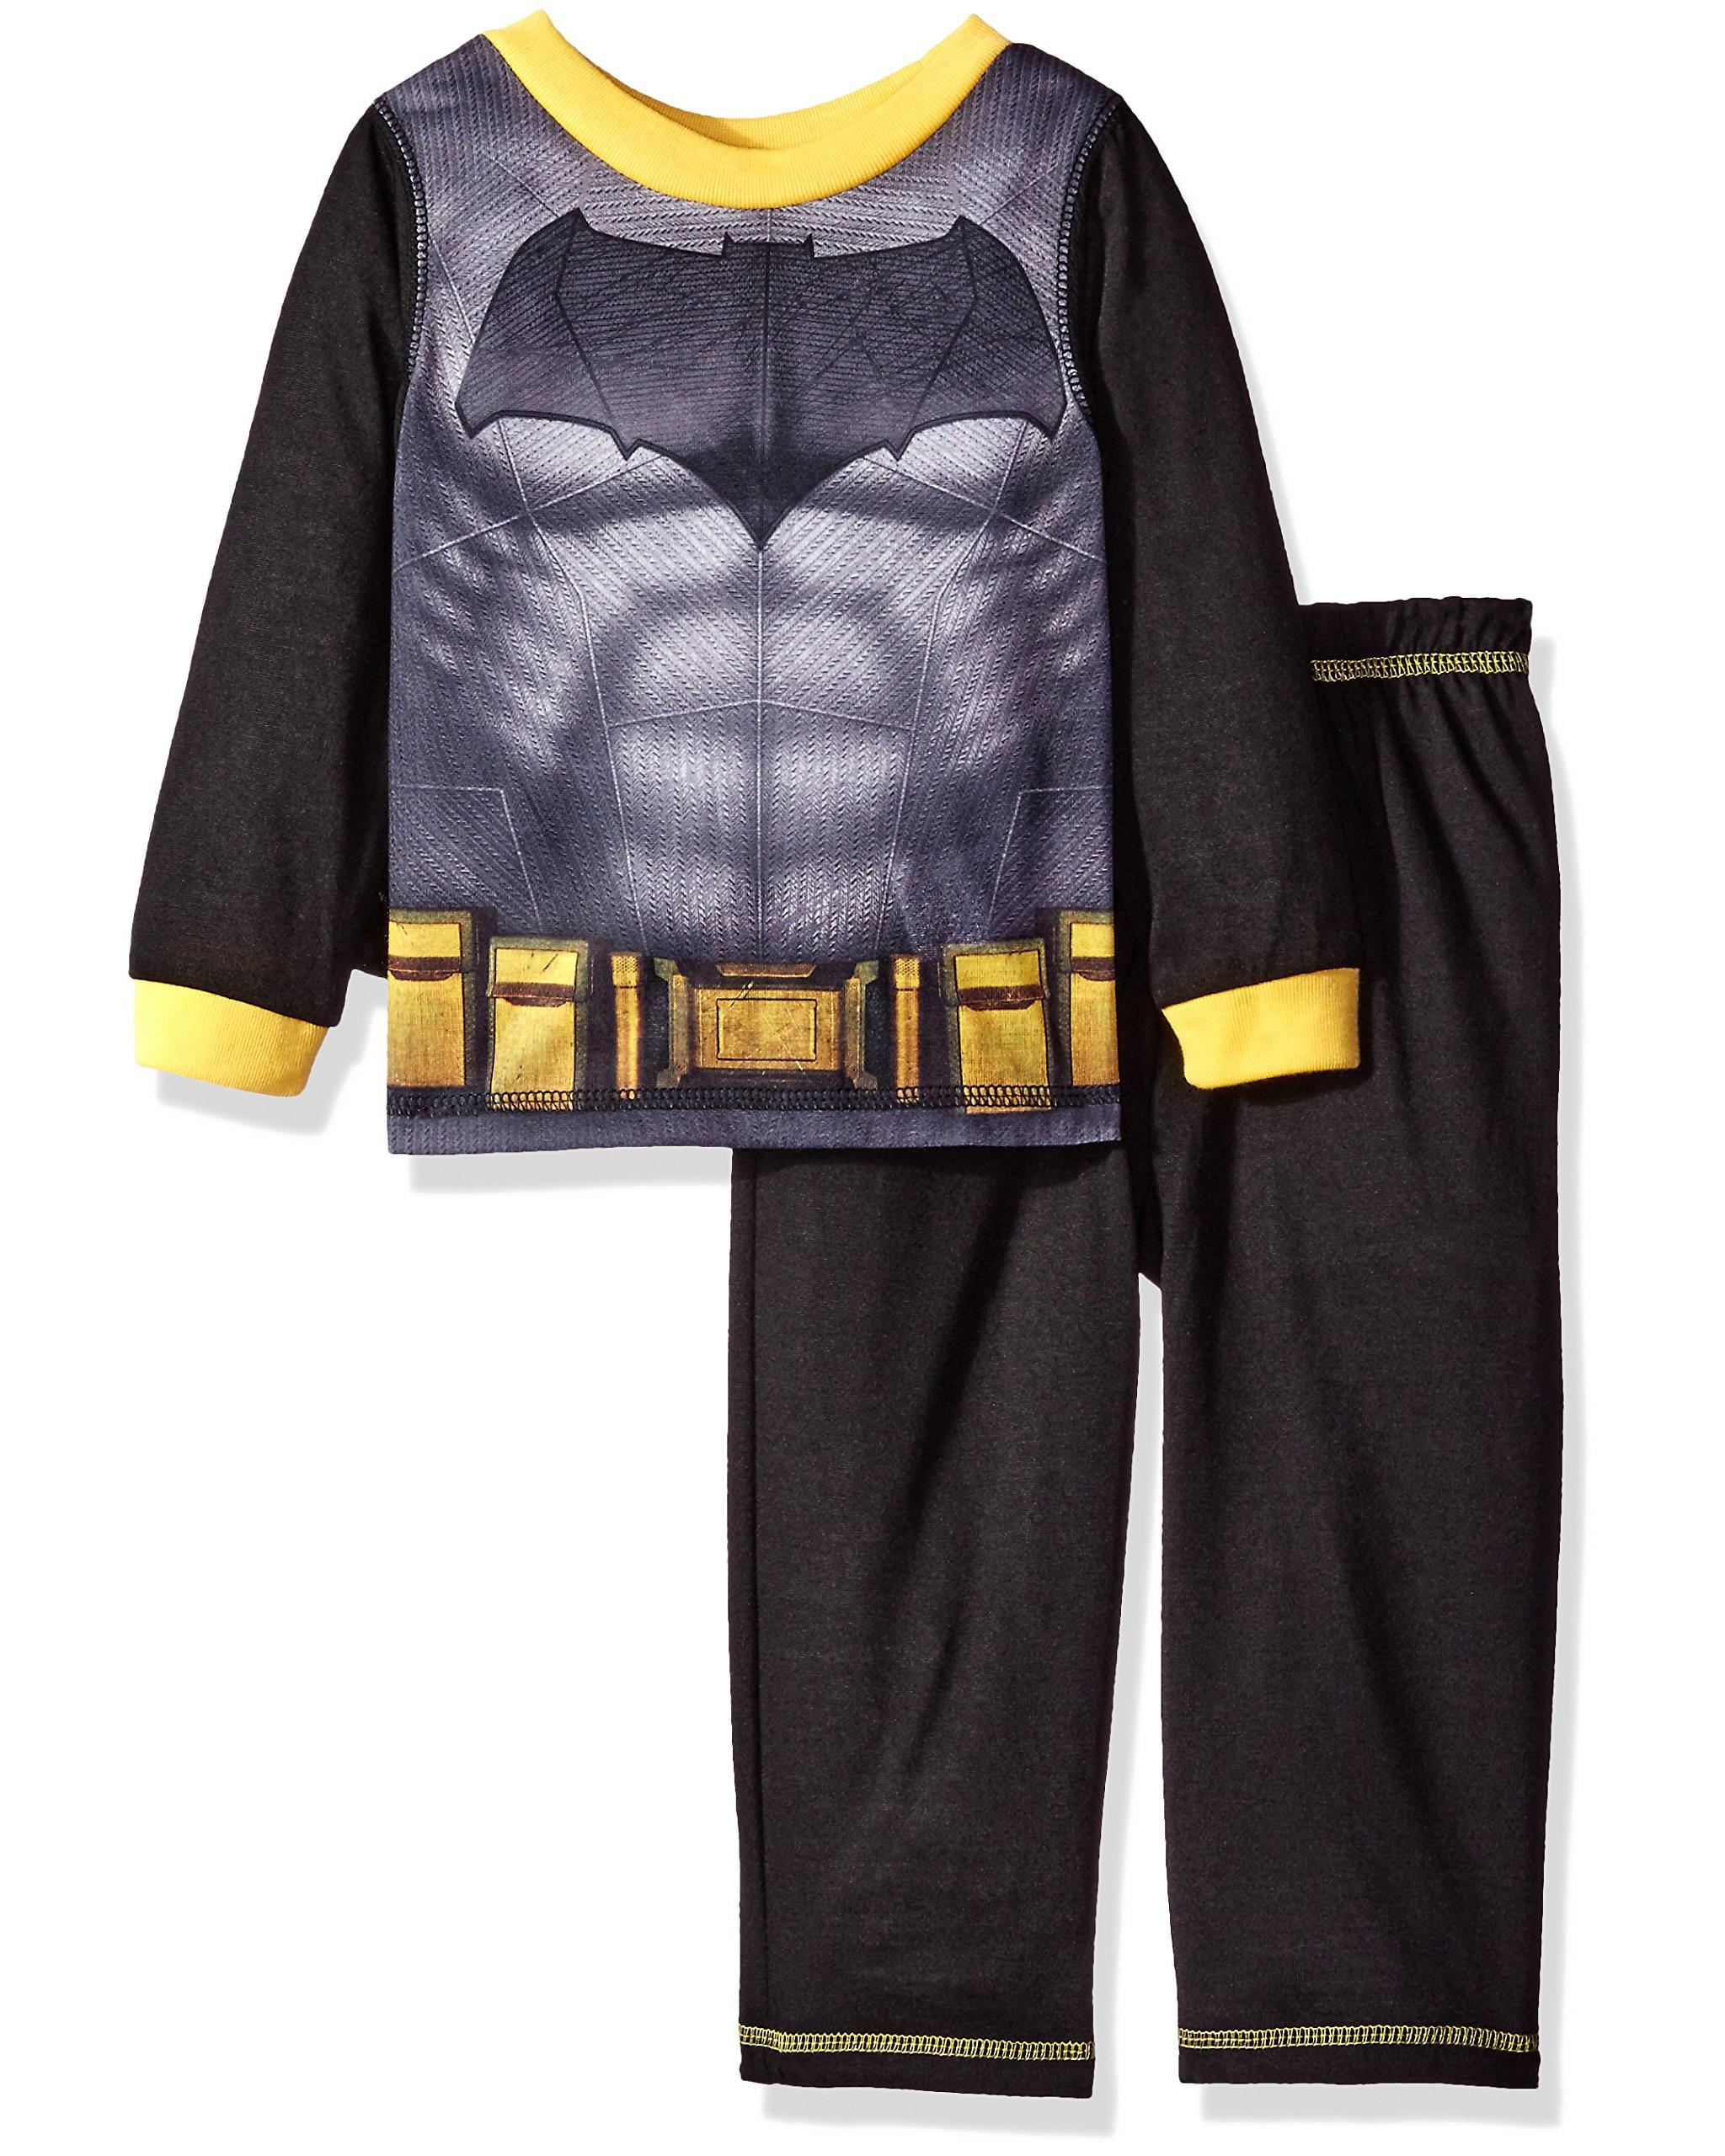 0d3c5aaf79 DC Comics Toddler Boys  Batman Superman 2pc Set W  Cape